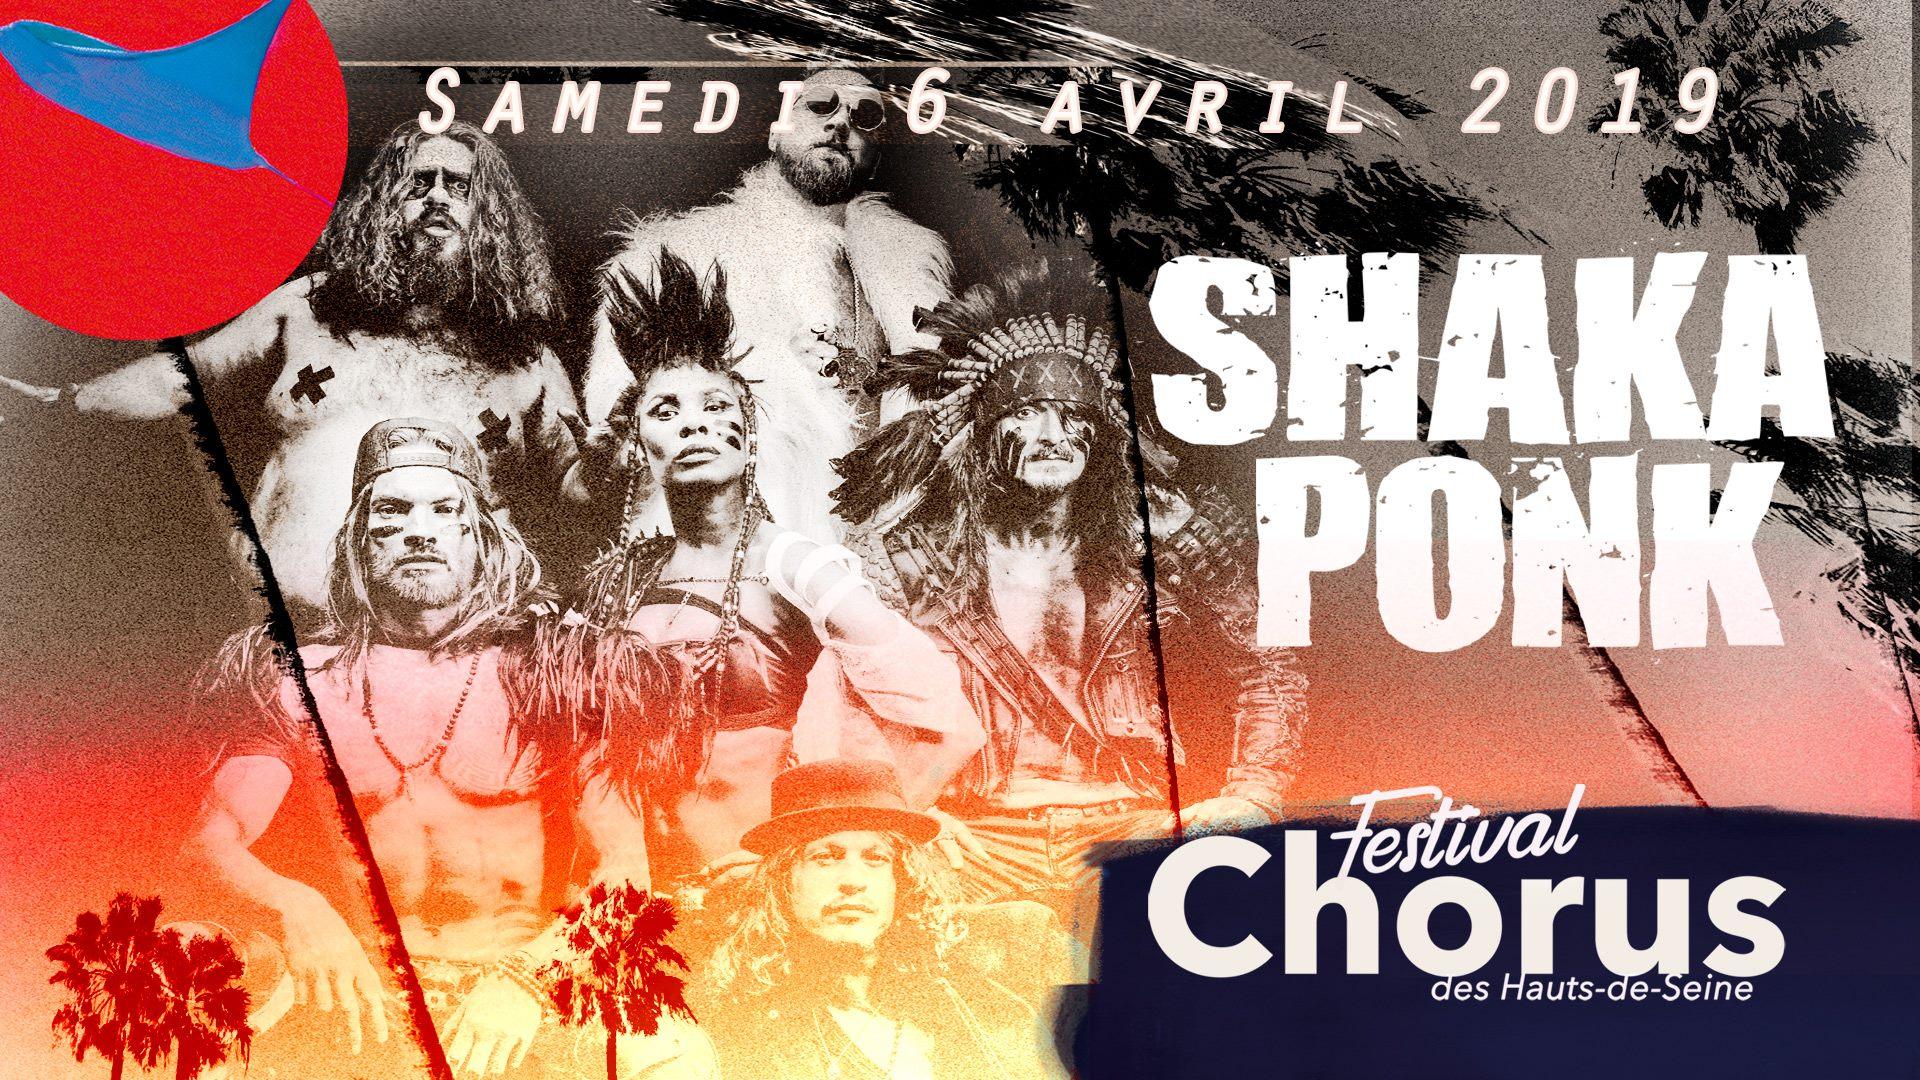 06/04 - Festival Chorus / Boulogne